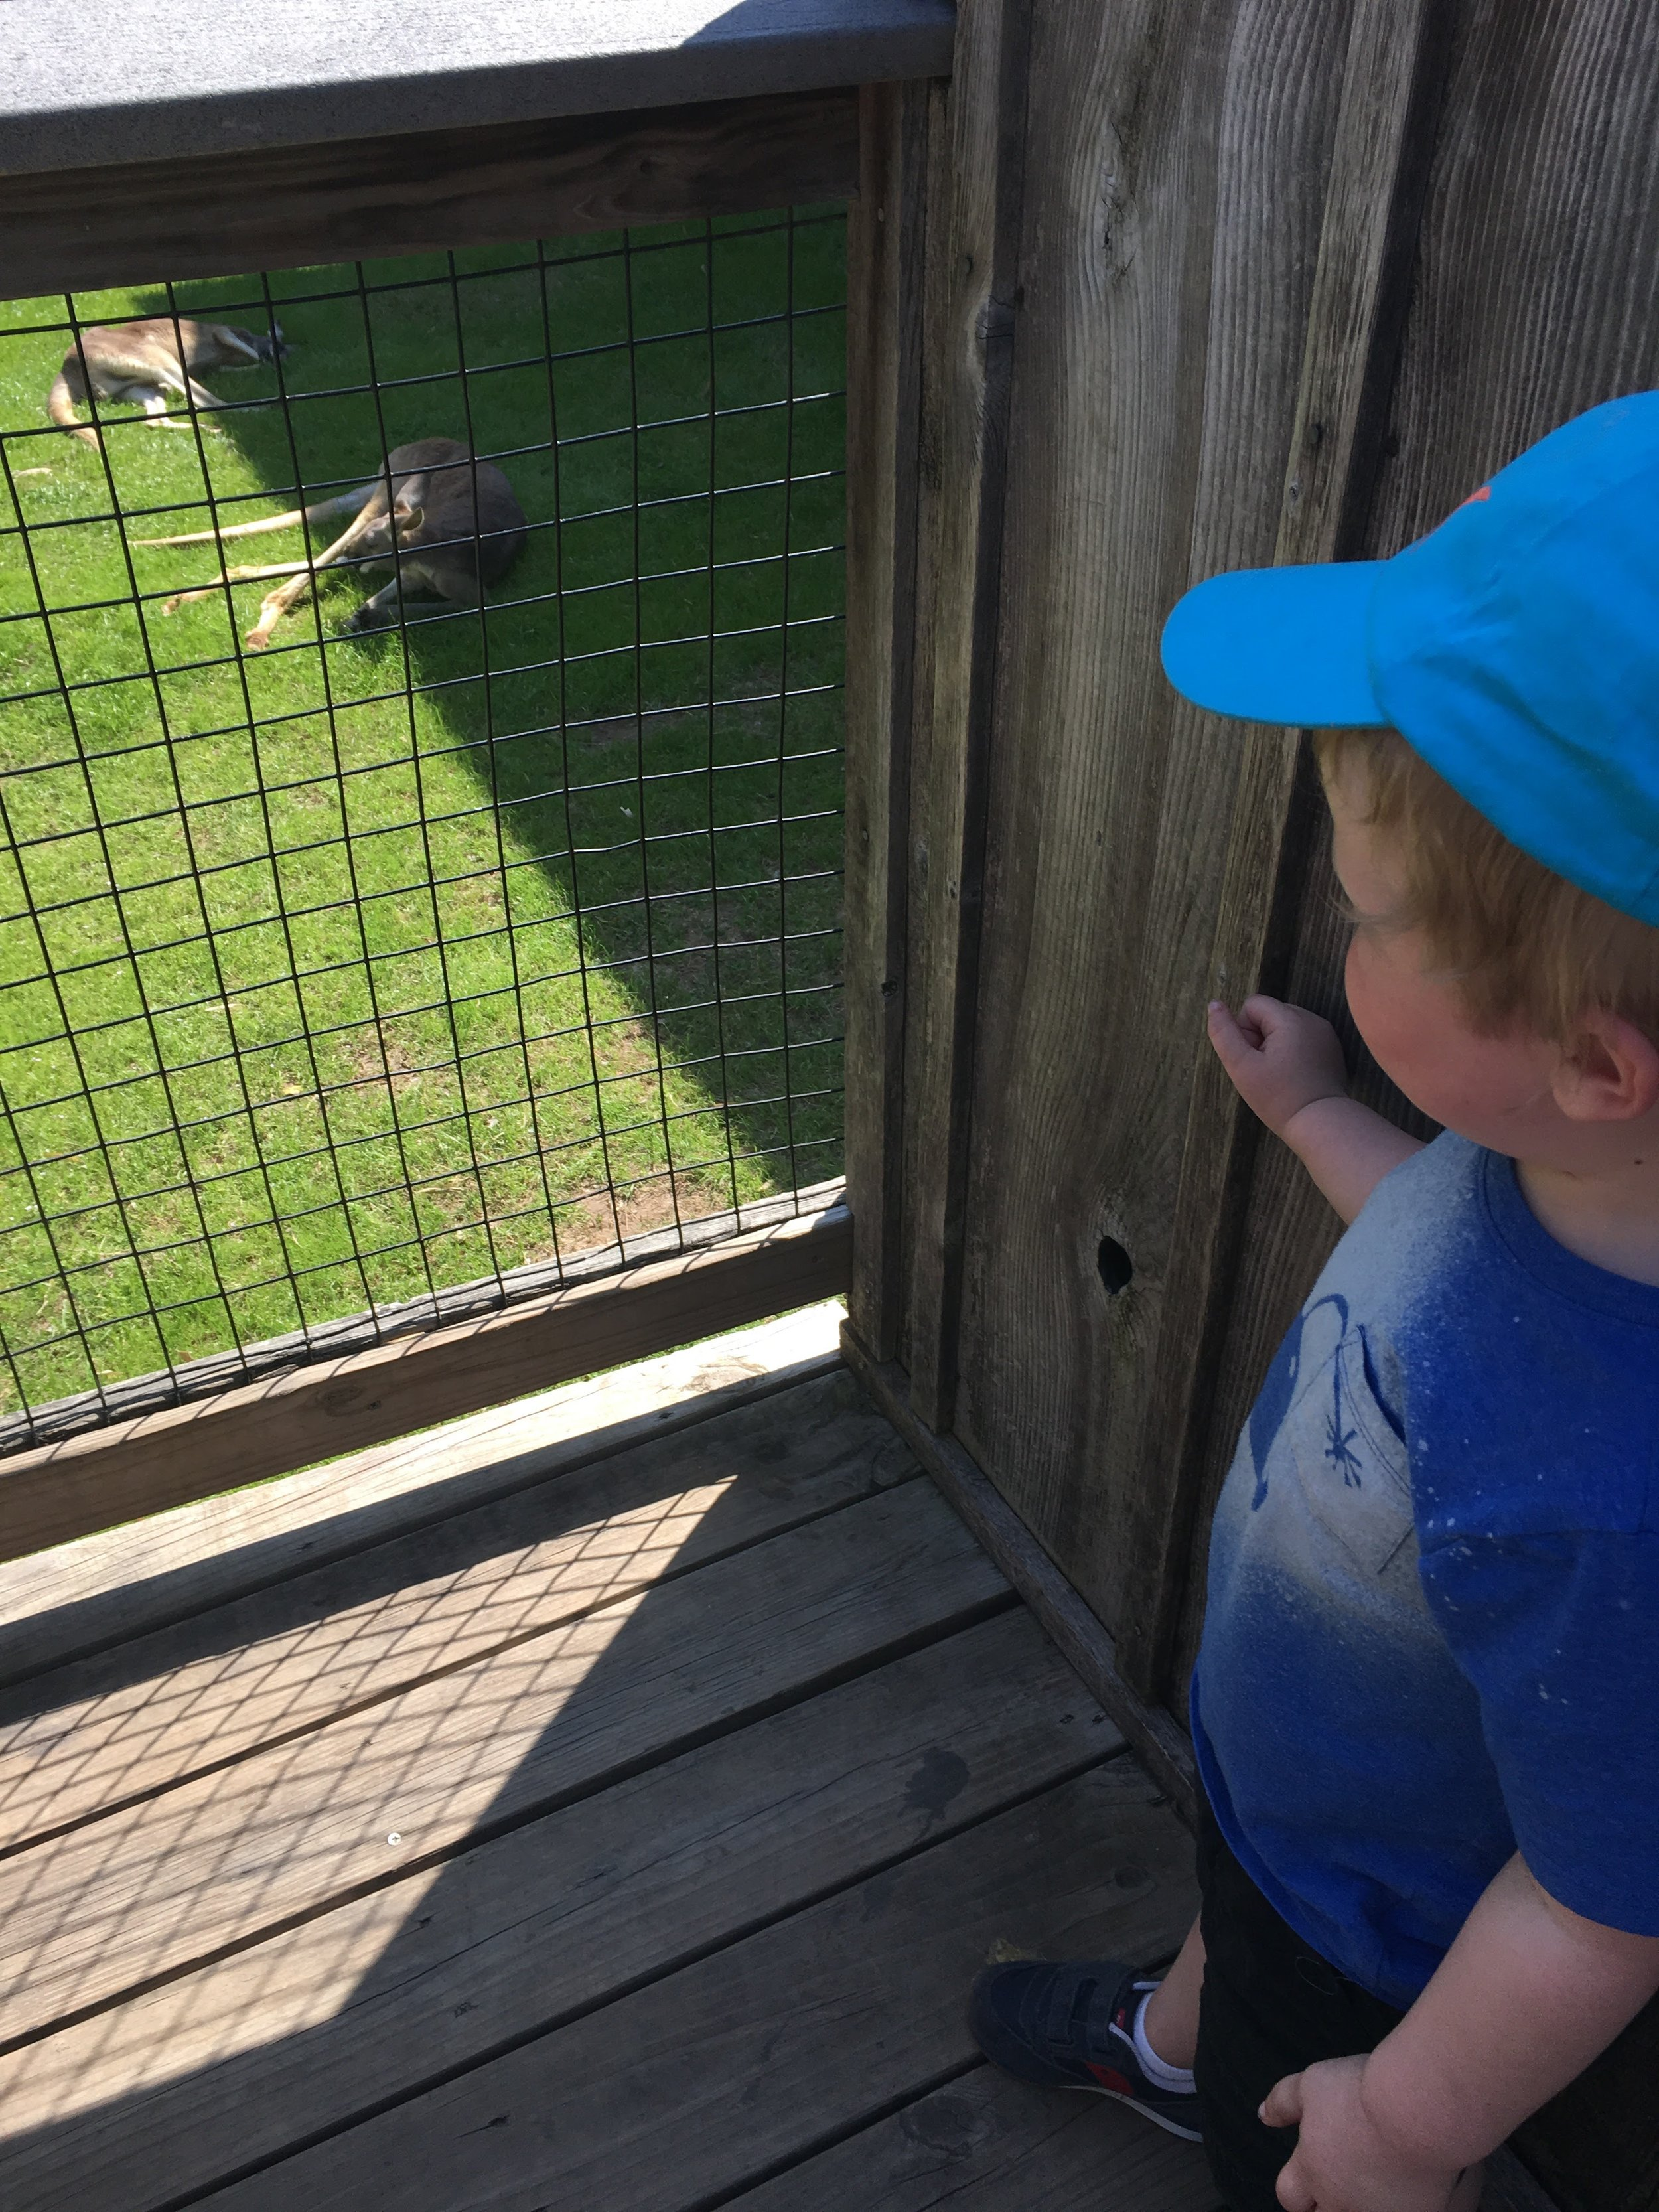 Watching a sleeping kangaroo at the Ft. Worth Zoo